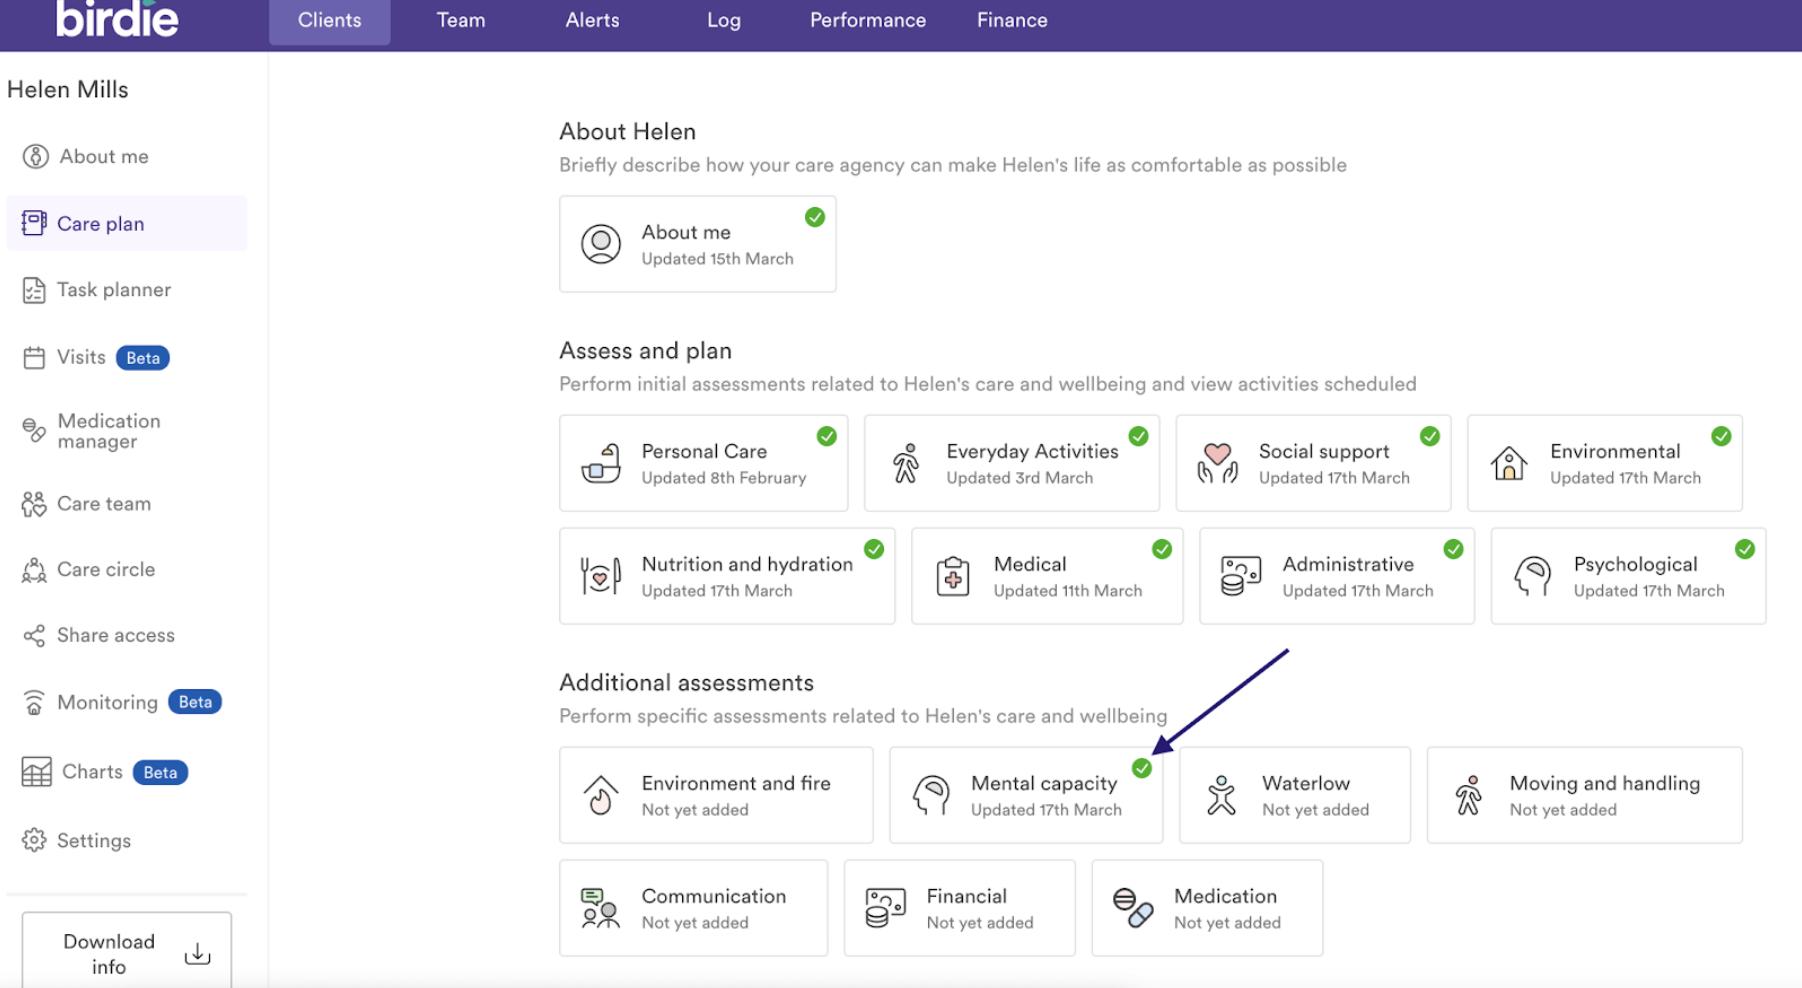 Screenshot showing Birdie App agency hub care plan section